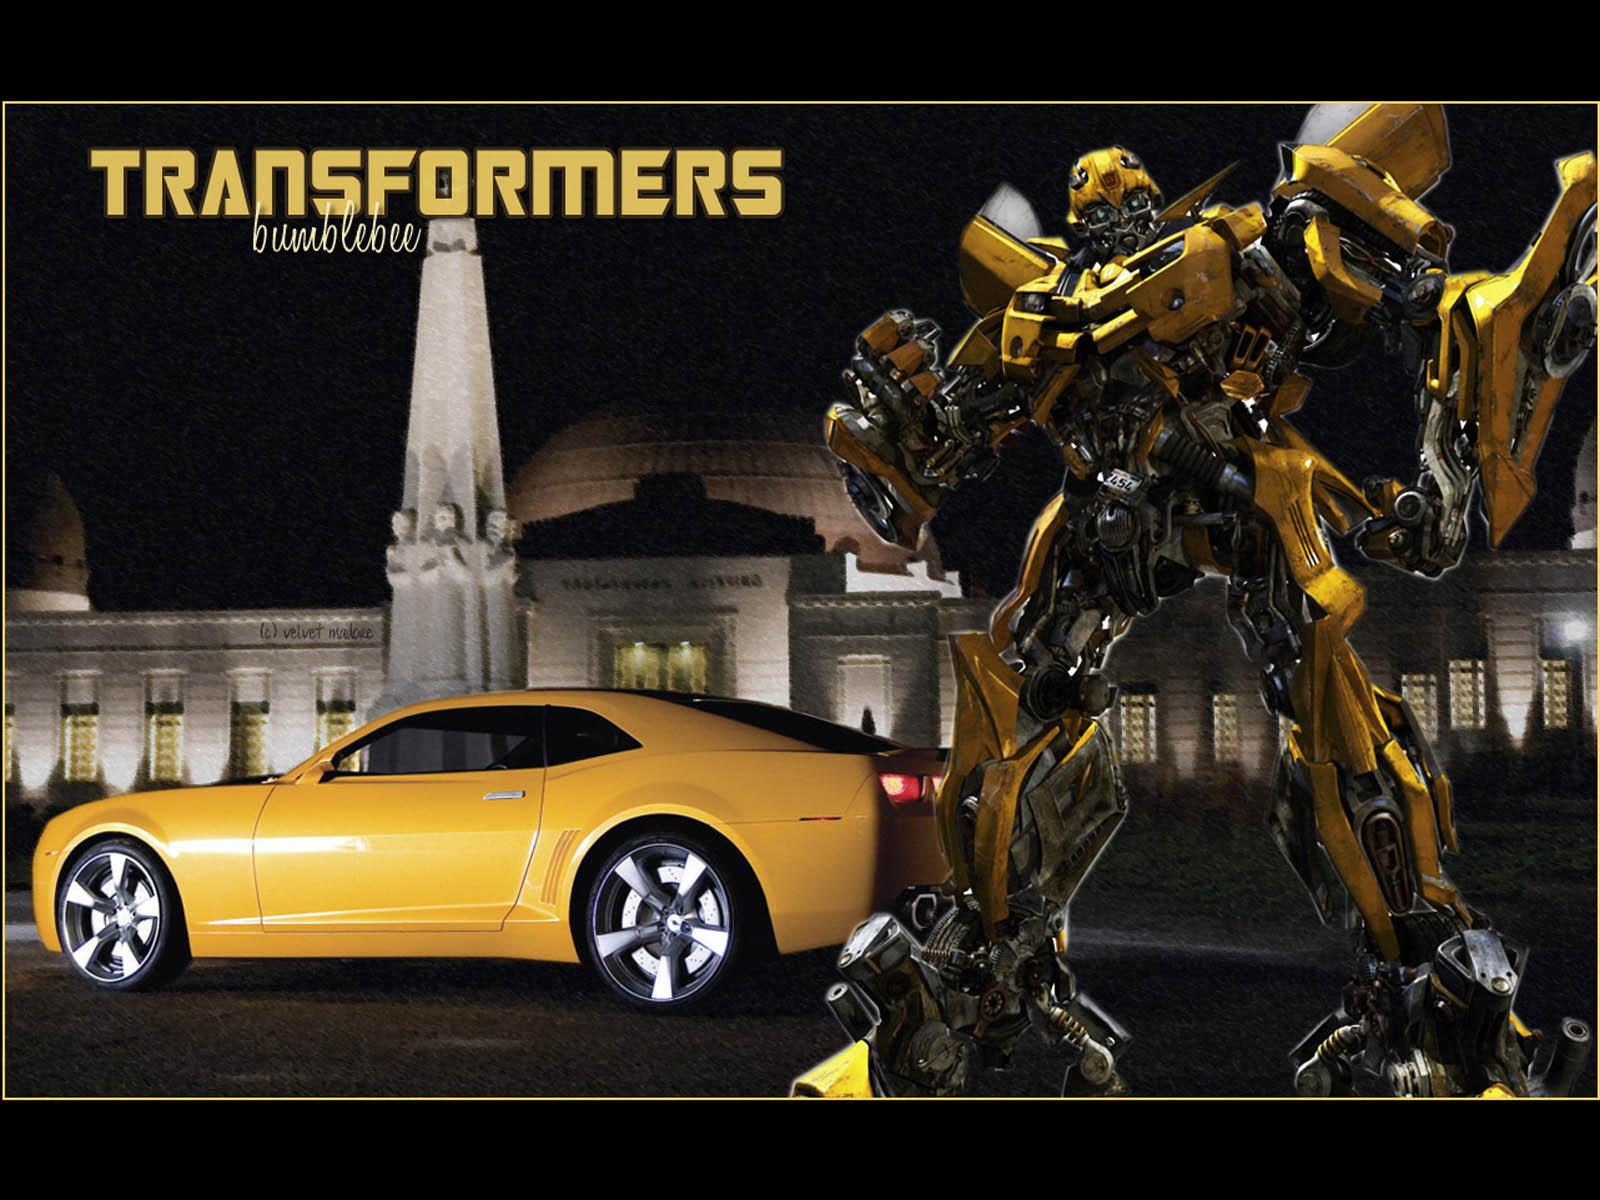 Bumblebee Car Wallpaper Download Wallpapers Transformers